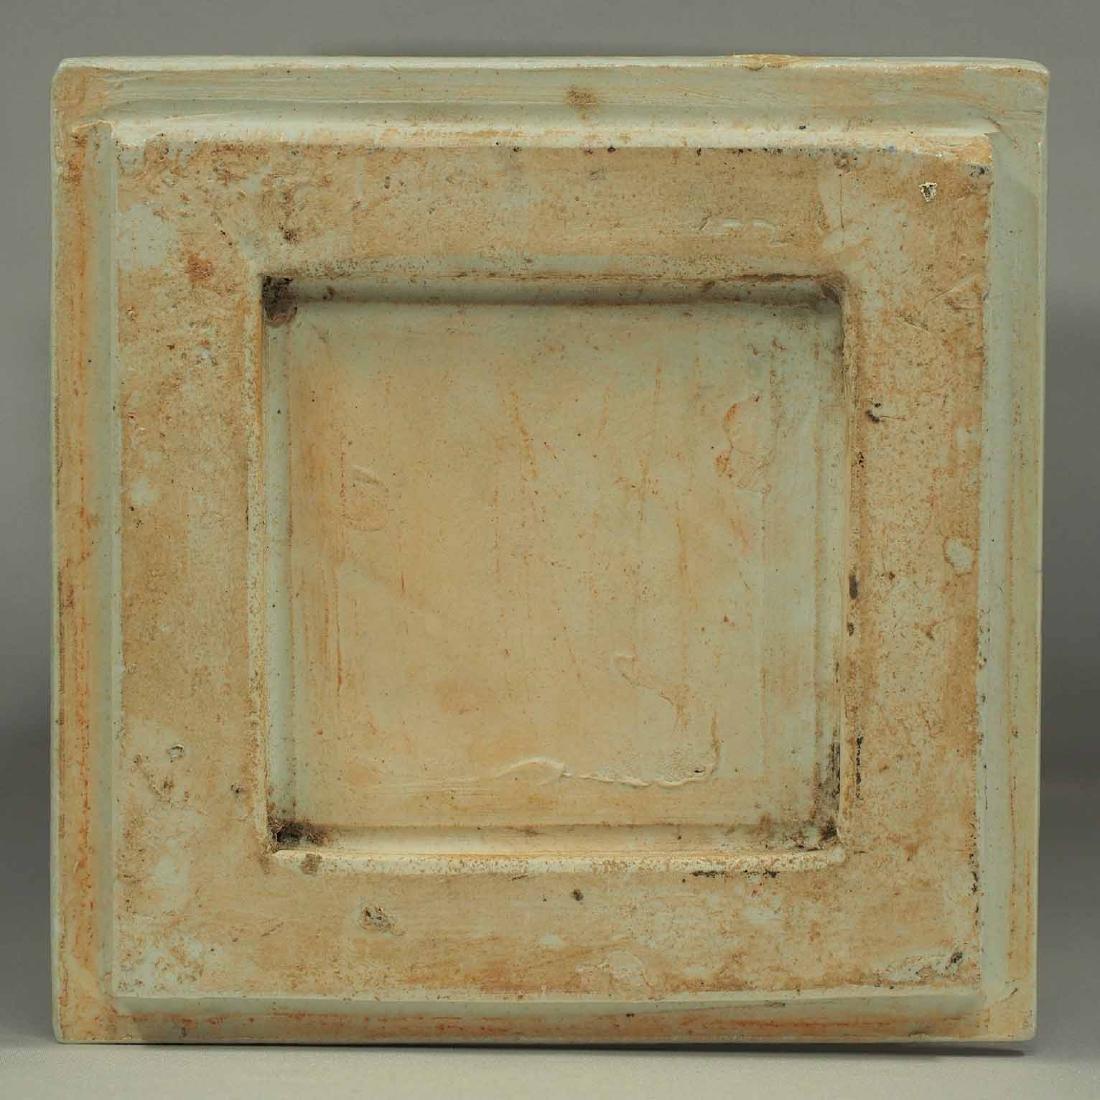 Square Gu-Form Vase, Tongzhi Period, Qing Dynasty - 11